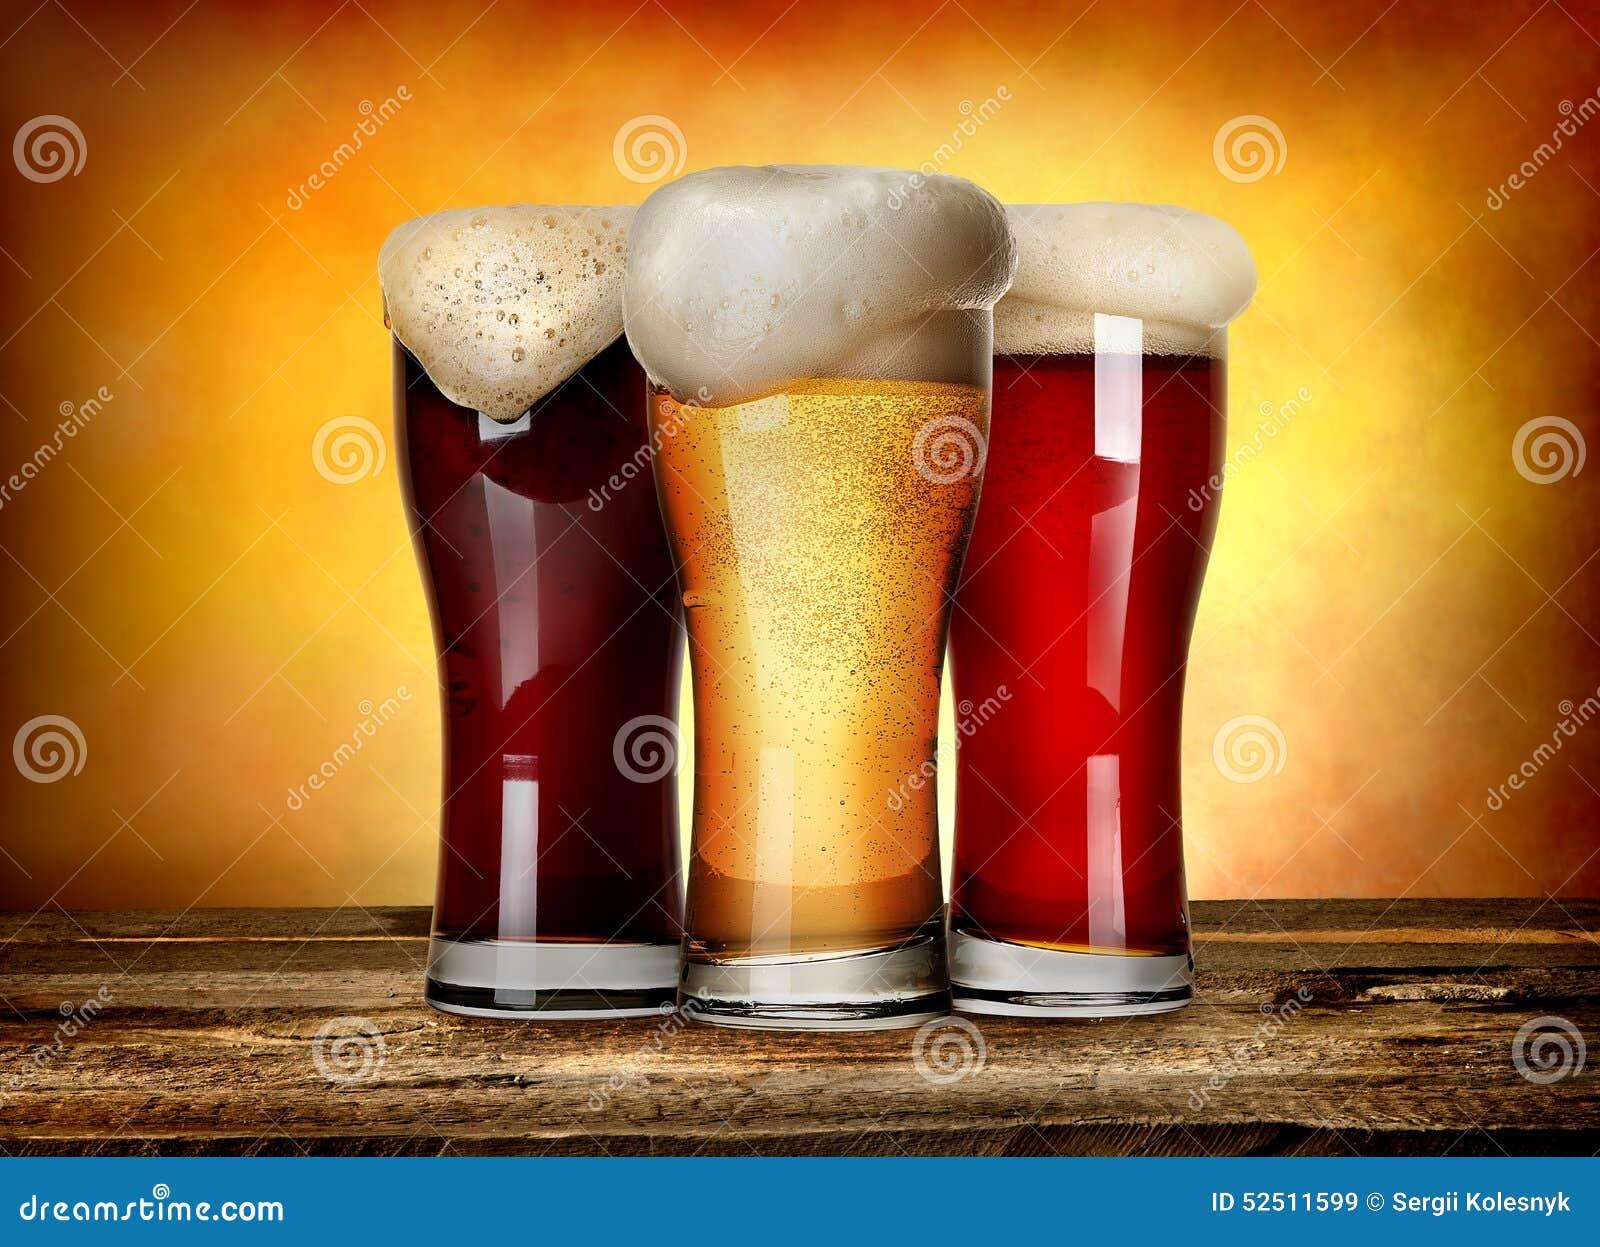 Tres clases de cerveza